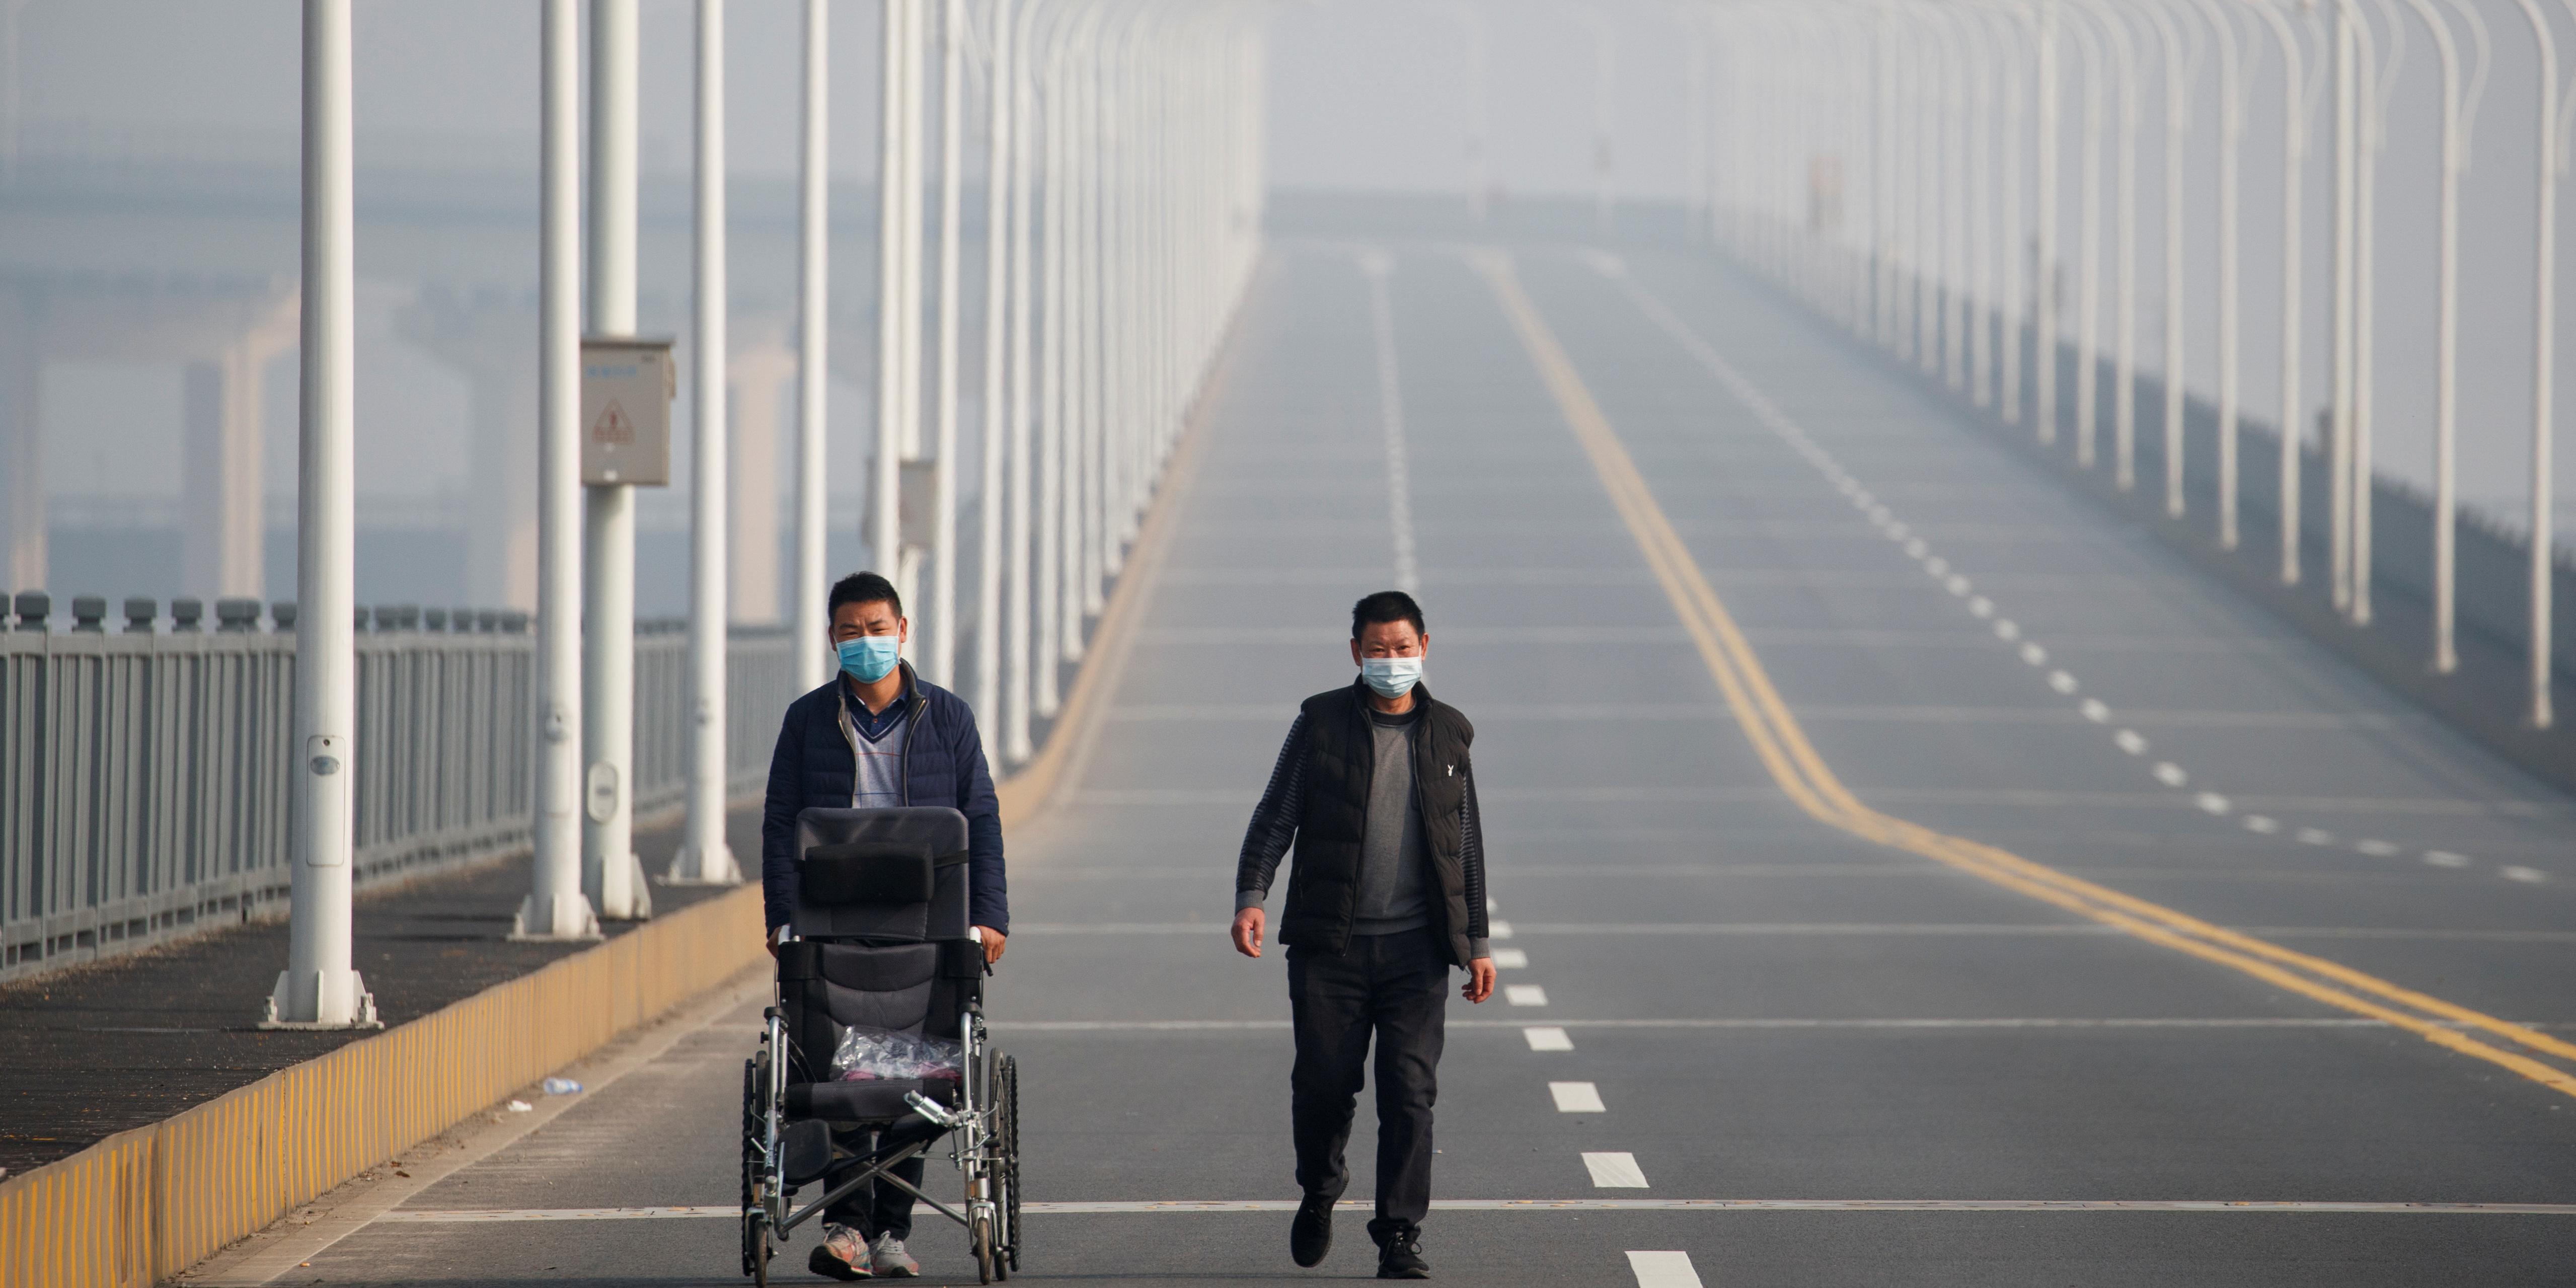 coronavirus-bilan-porte-a-213-morts-en-chine-ou-continuent-les-evacuations